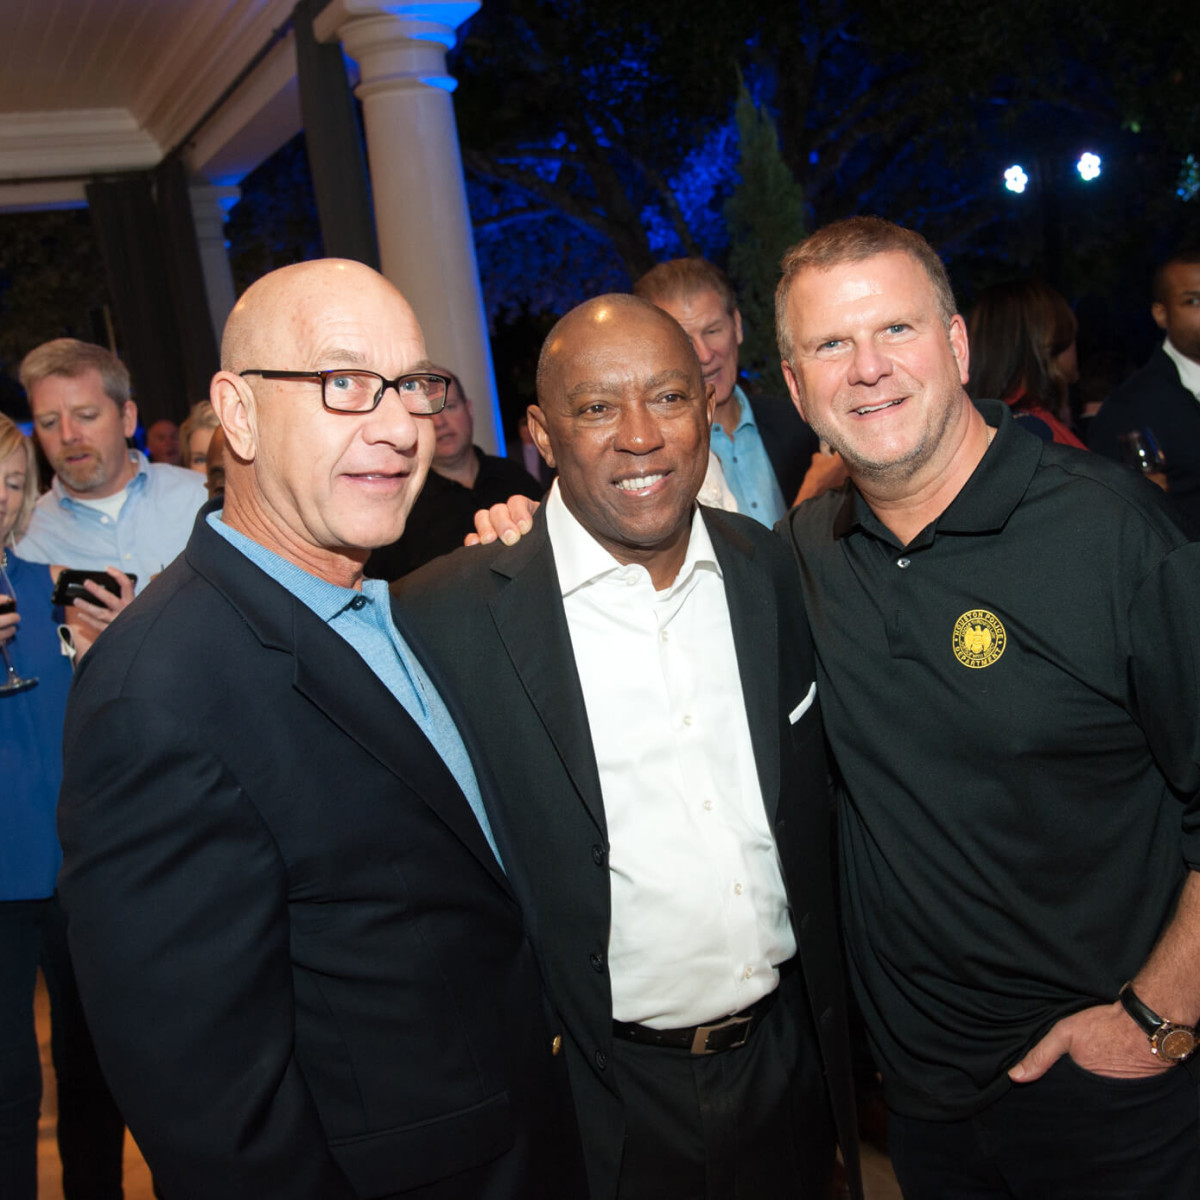 Houston, HPD True Blue Gala, Oct. 2016, Senator John Whitmire, Mayor Sylvester Turner, Tilman Fertitta